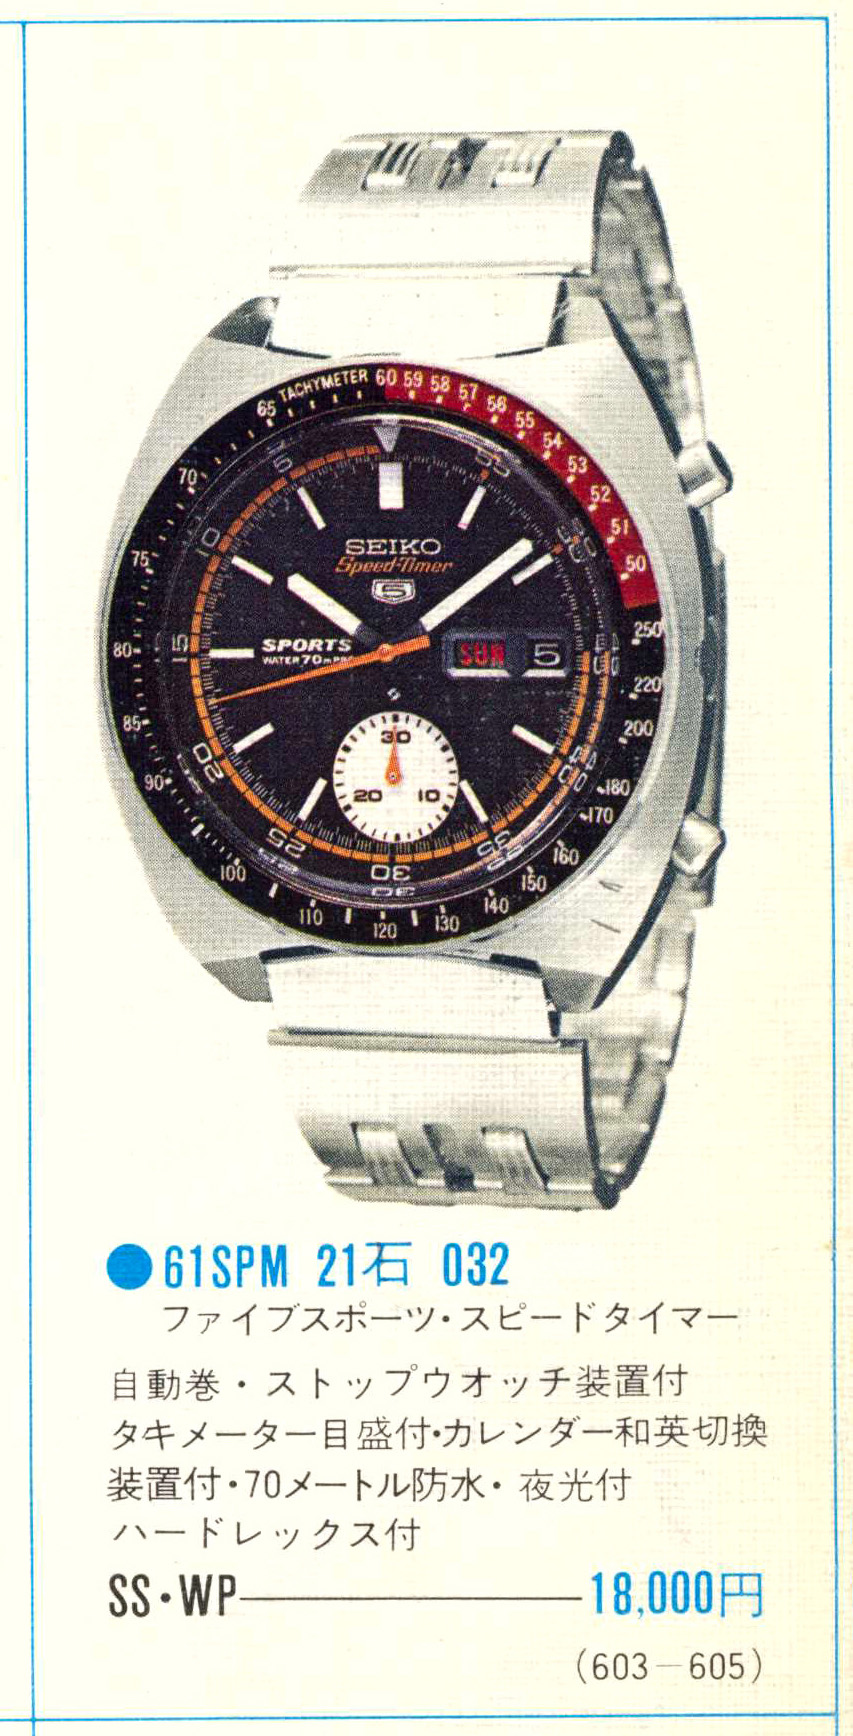 61SPM 032